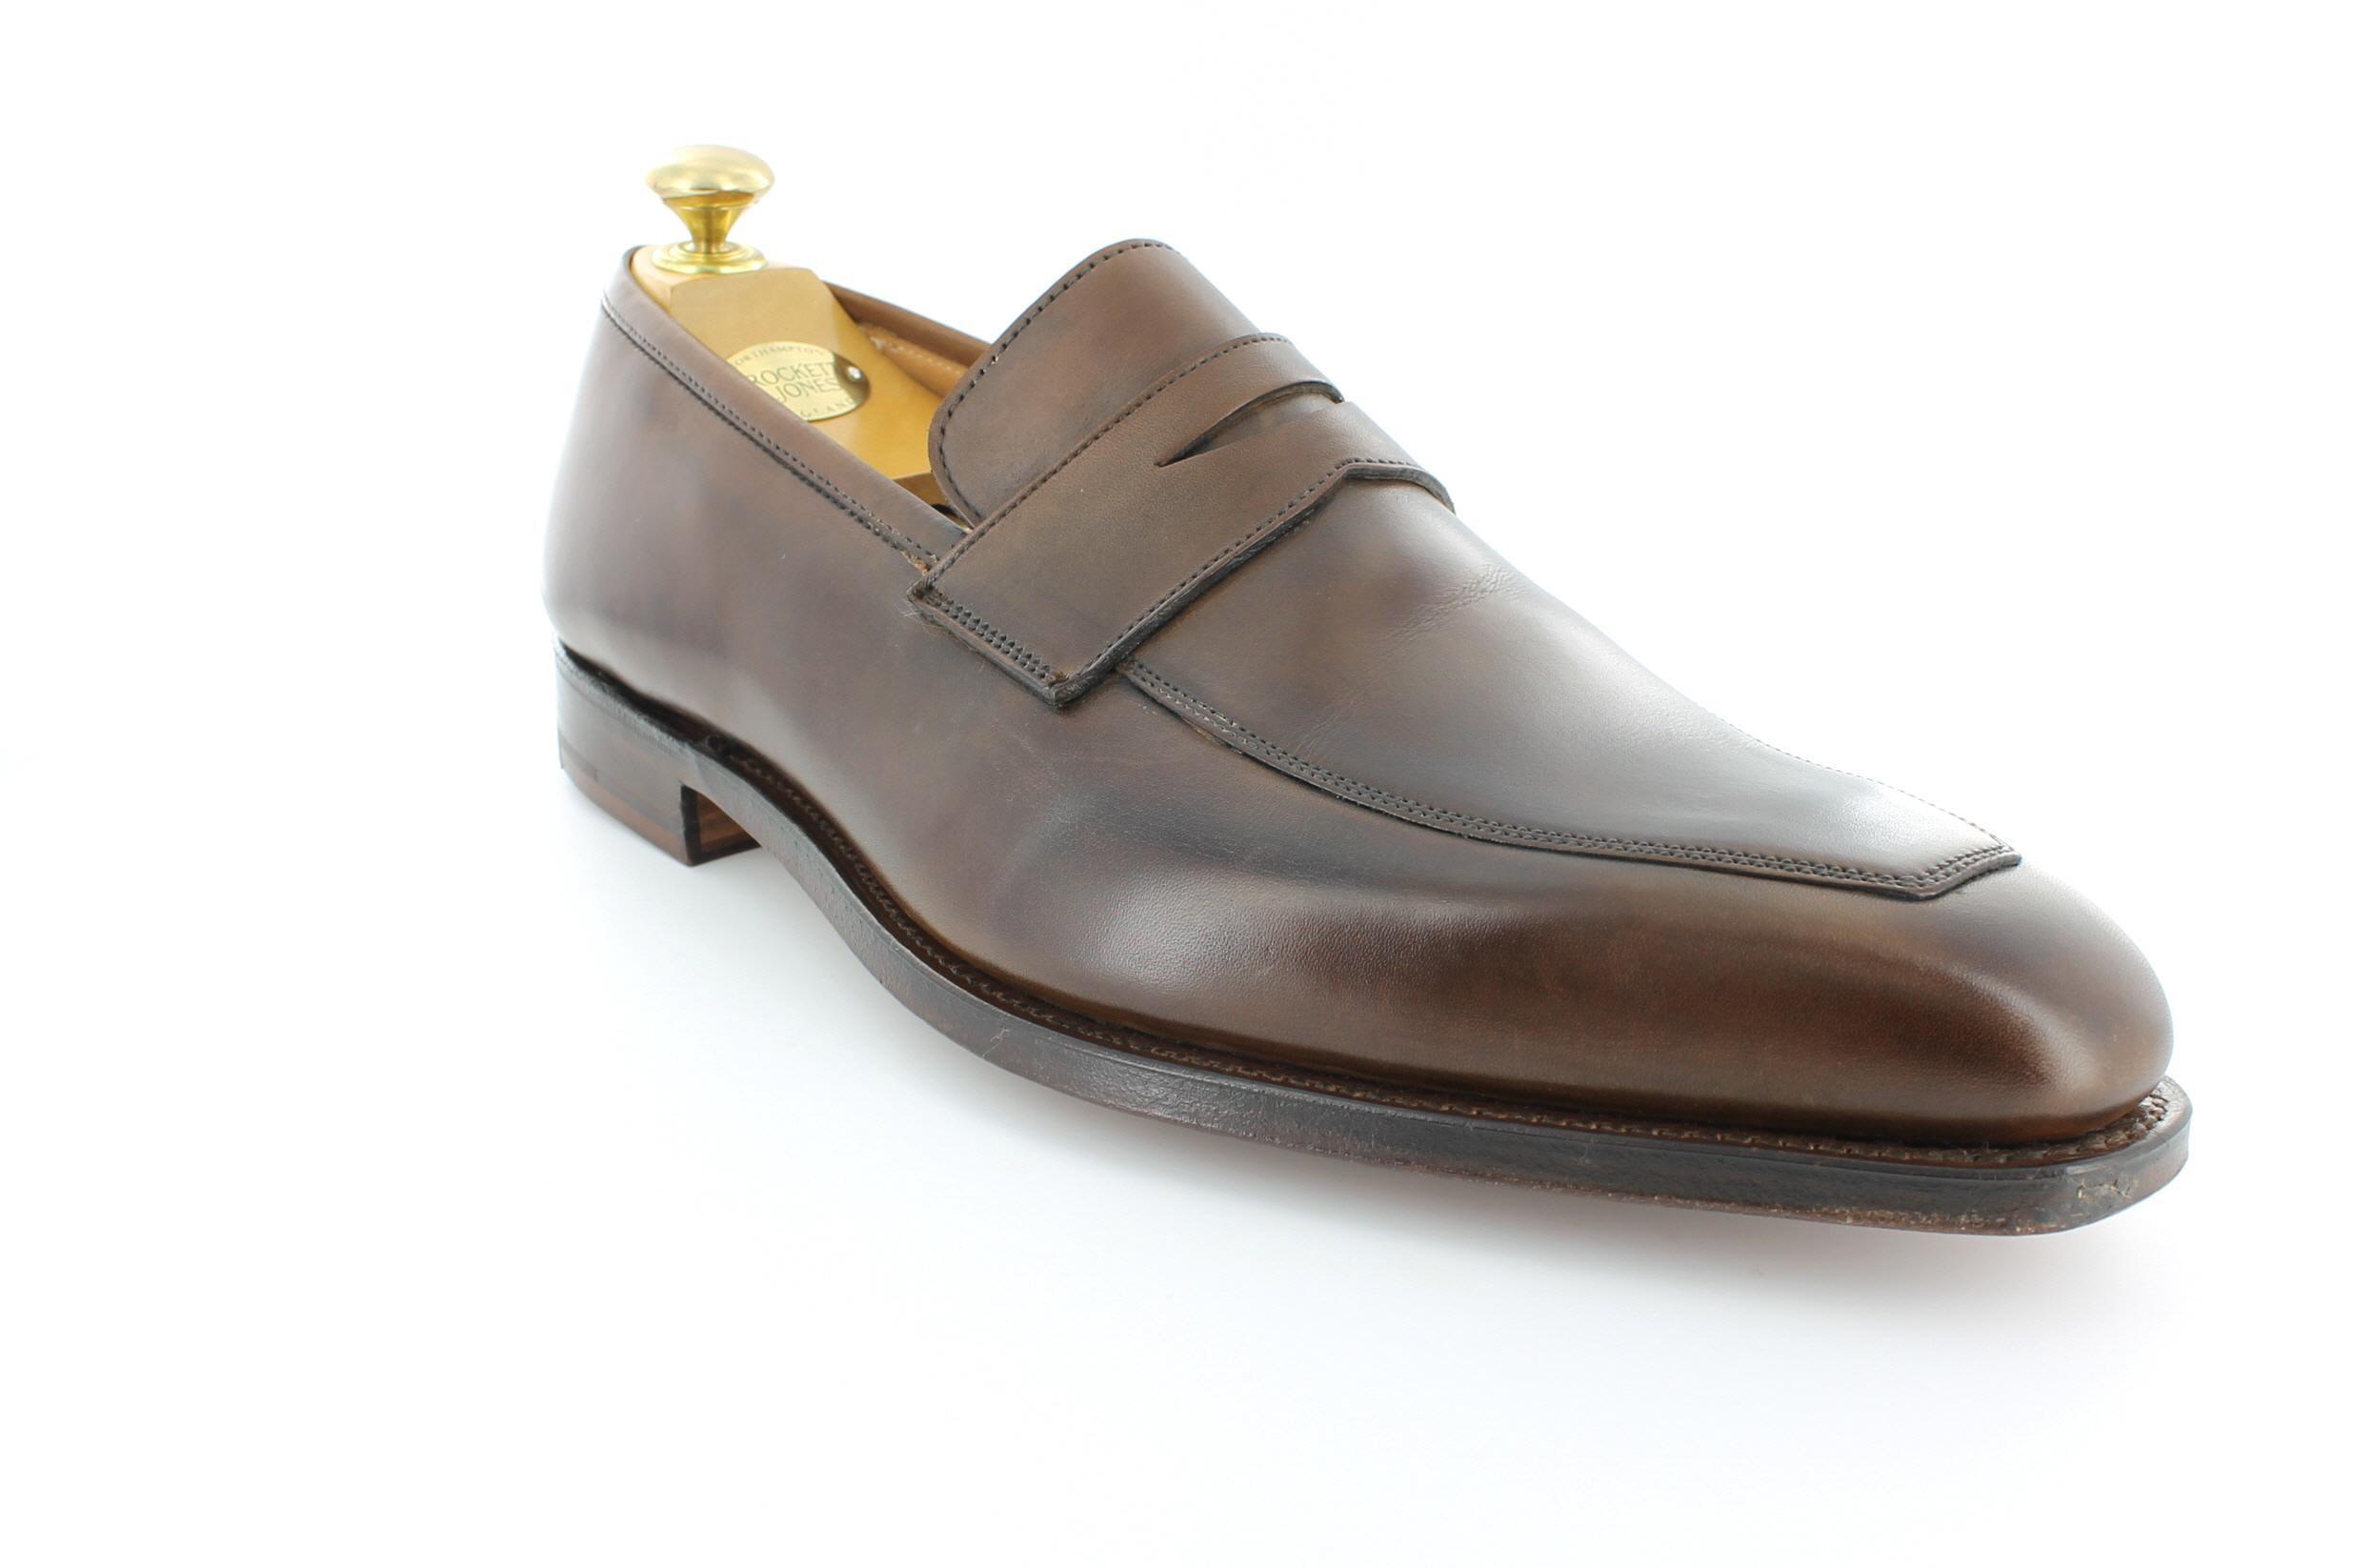 winter-shoes-loafer1.jpg